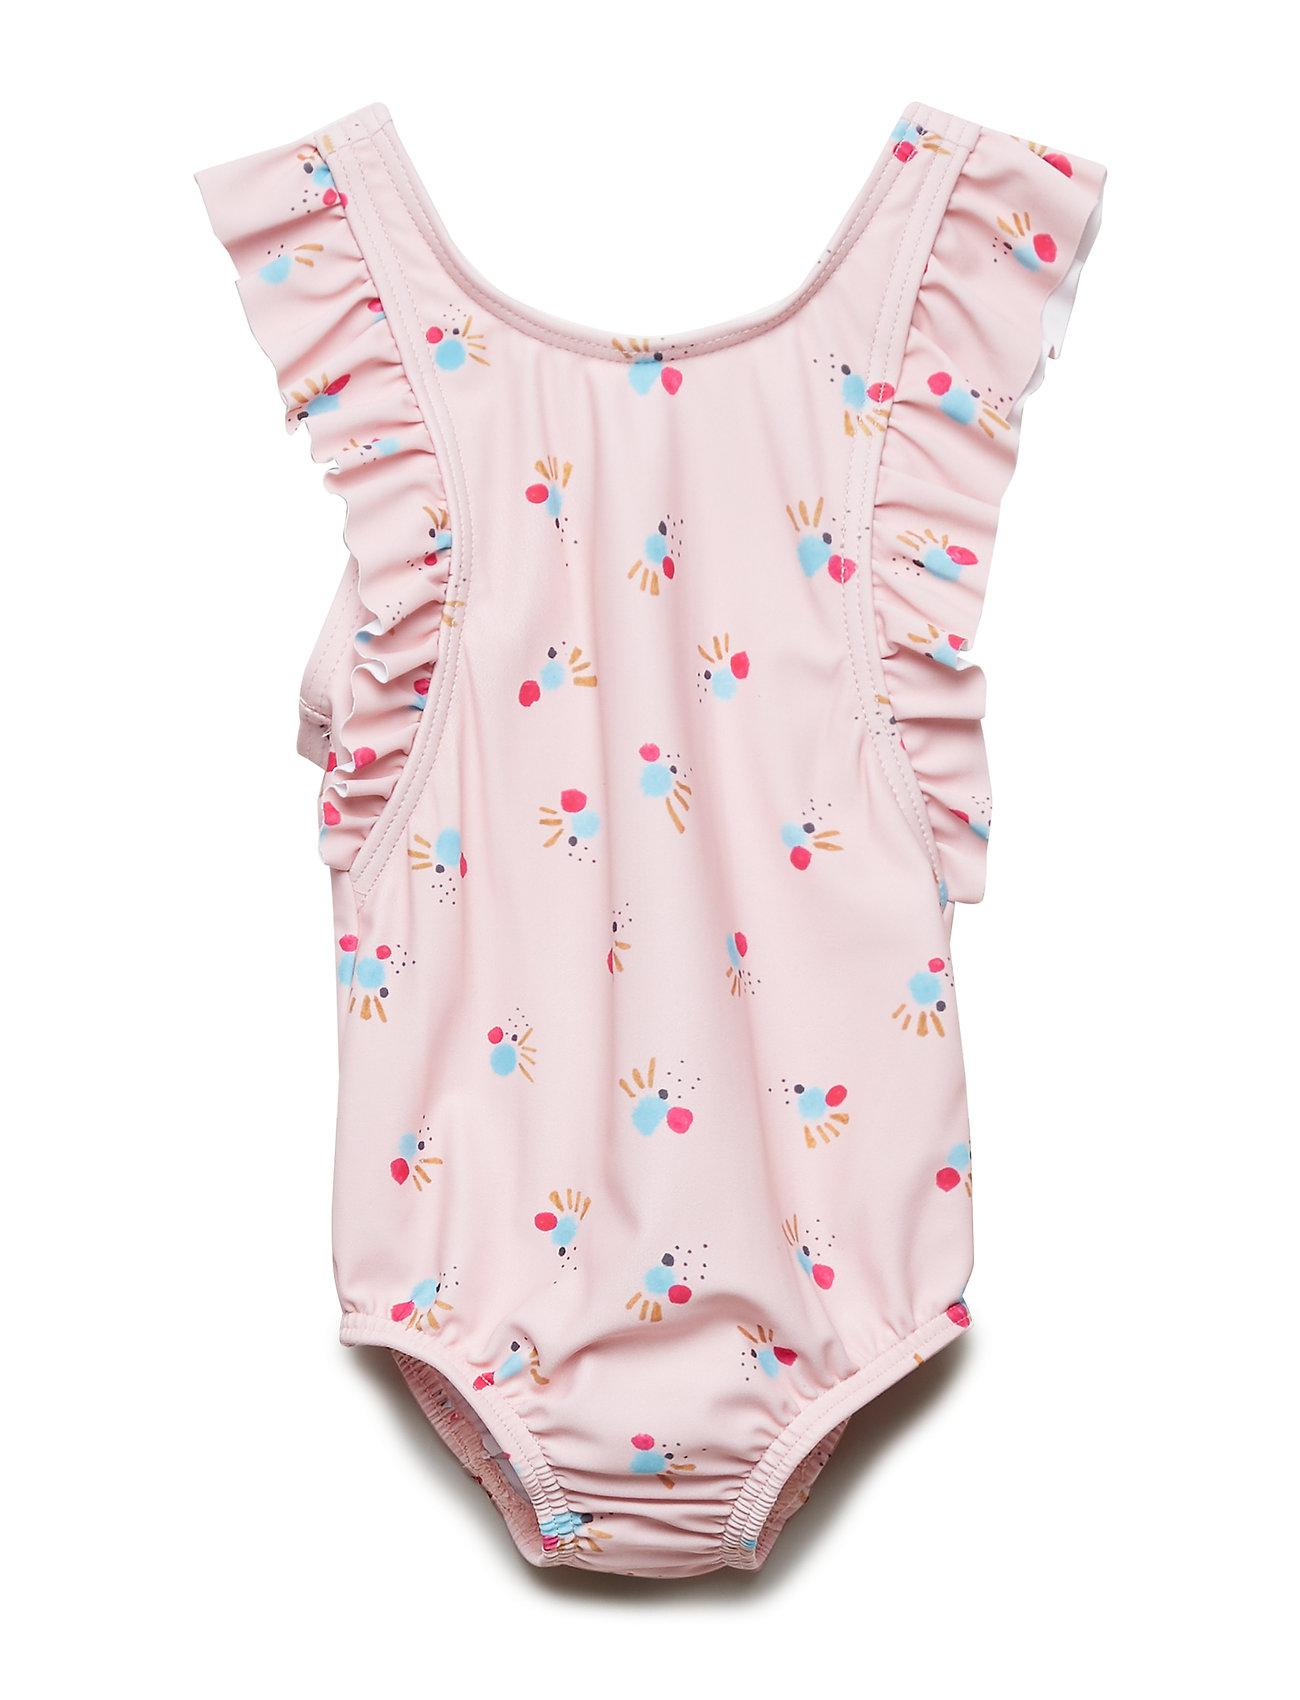 Soft Gallery Baby Ana Swimsuit - CHINTZ ROSE, AOP COCKATOO SWIM